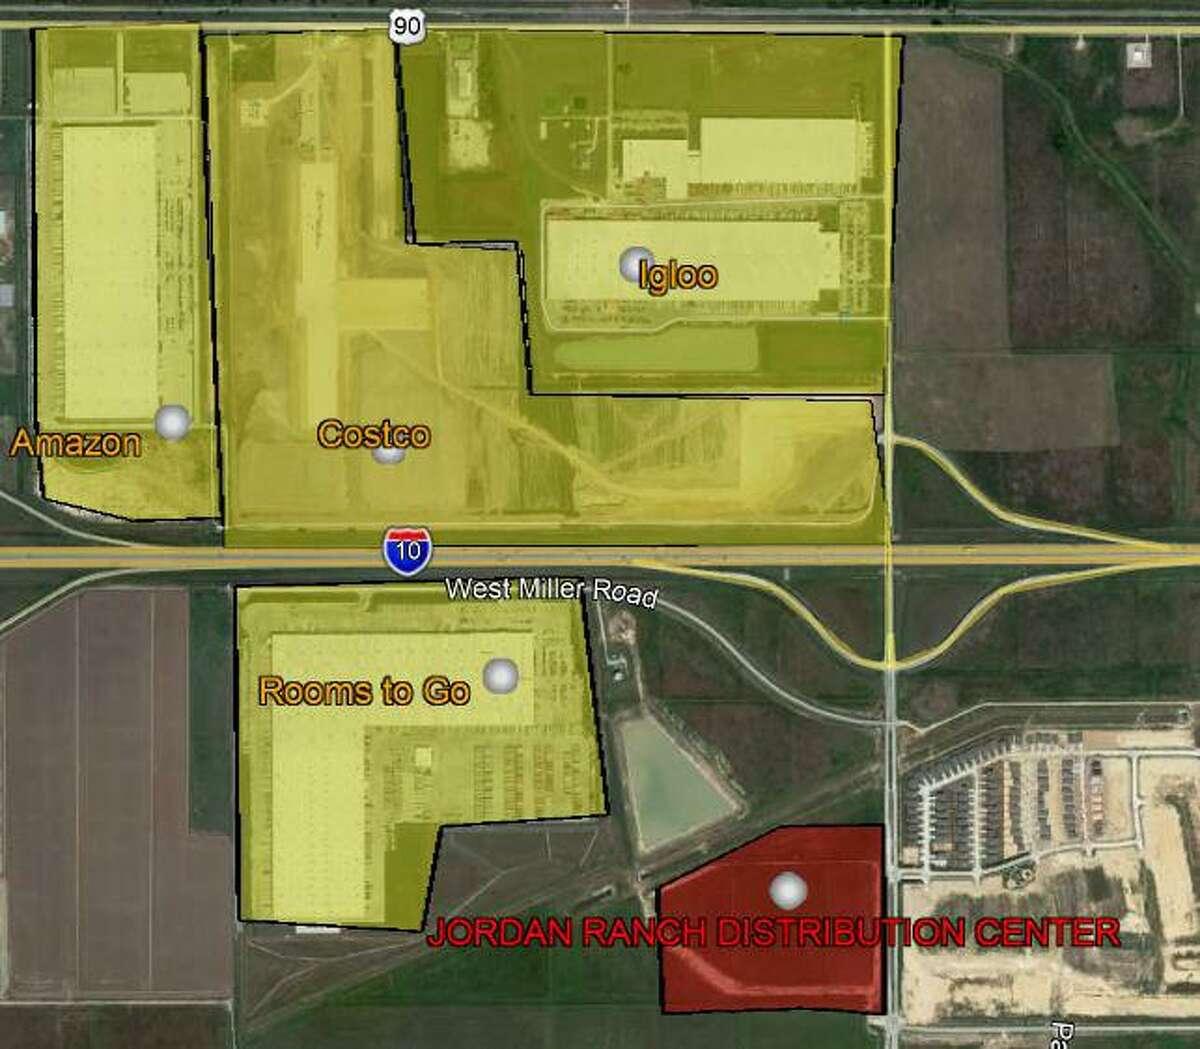 Jordan Ranch Distribution Center, a planned495,000-square-foot development onJordan Ranch Boulevard at Kingsland Boulevard in Katy, will target e-commerce tenants. Phelan-Bennett Development is developing the project on behalf ofWPT Industrial REIT.